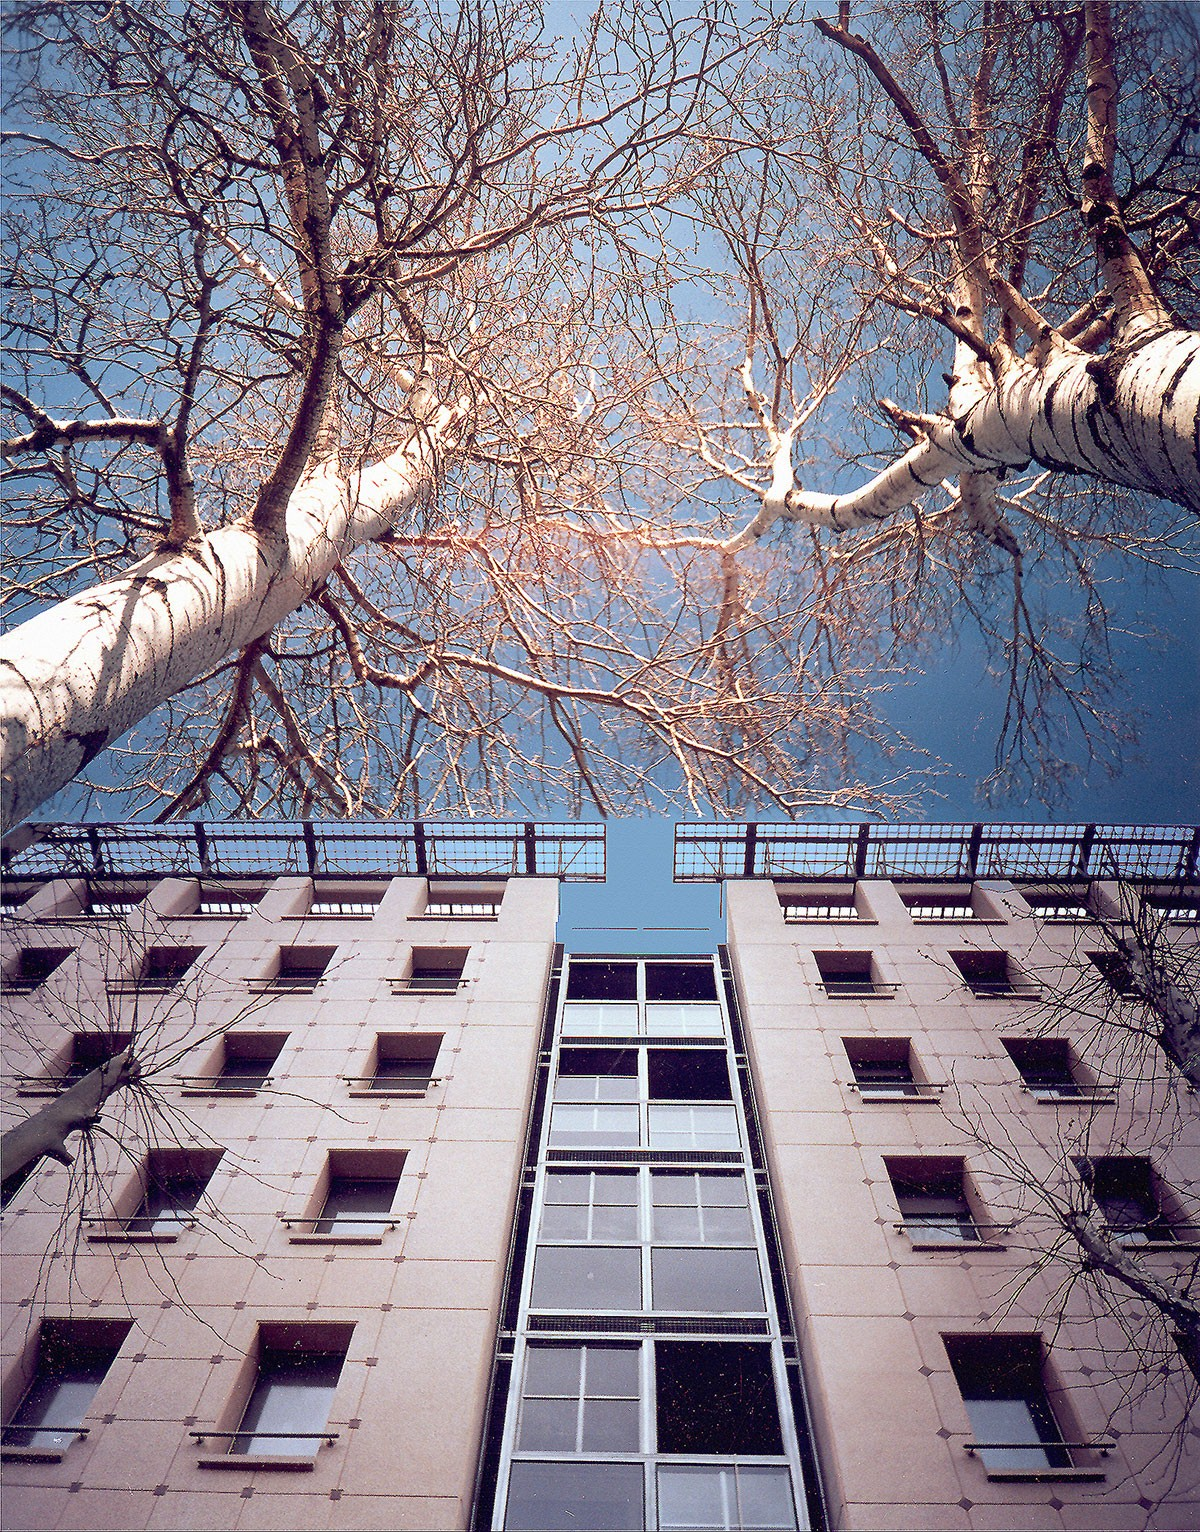 2000: Stambeno poslovni objekat u Bulevaru kralja Aleksandra u Beogradu - M. i D. Marušić